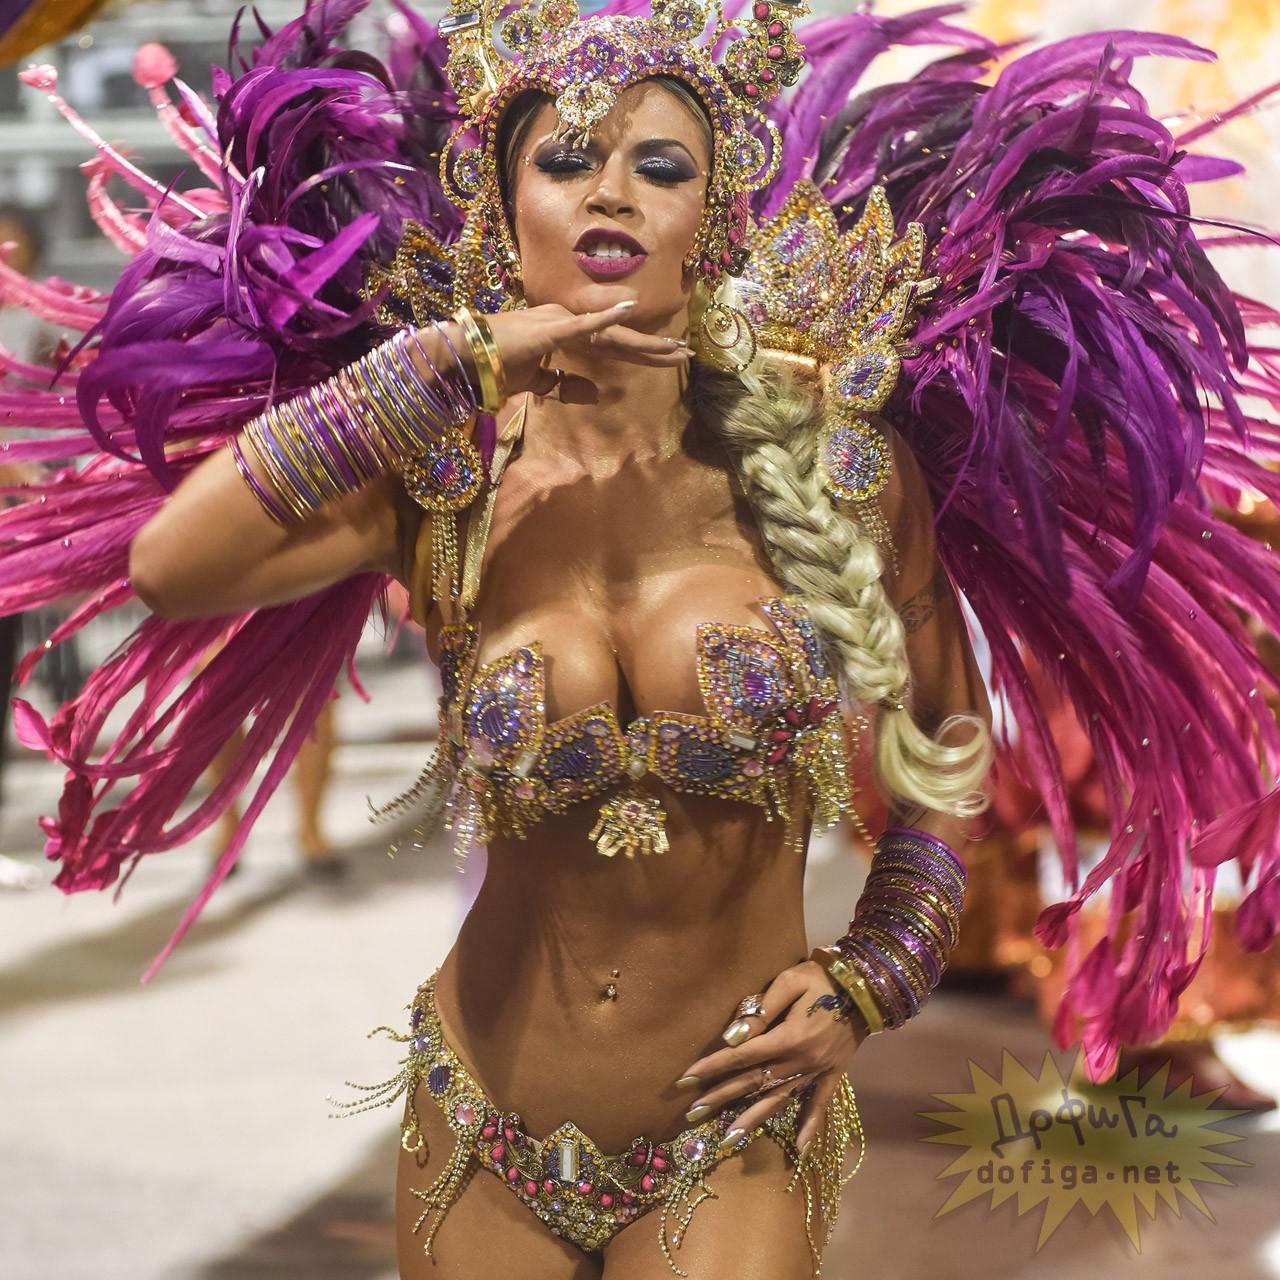 Rio carnival booty hot